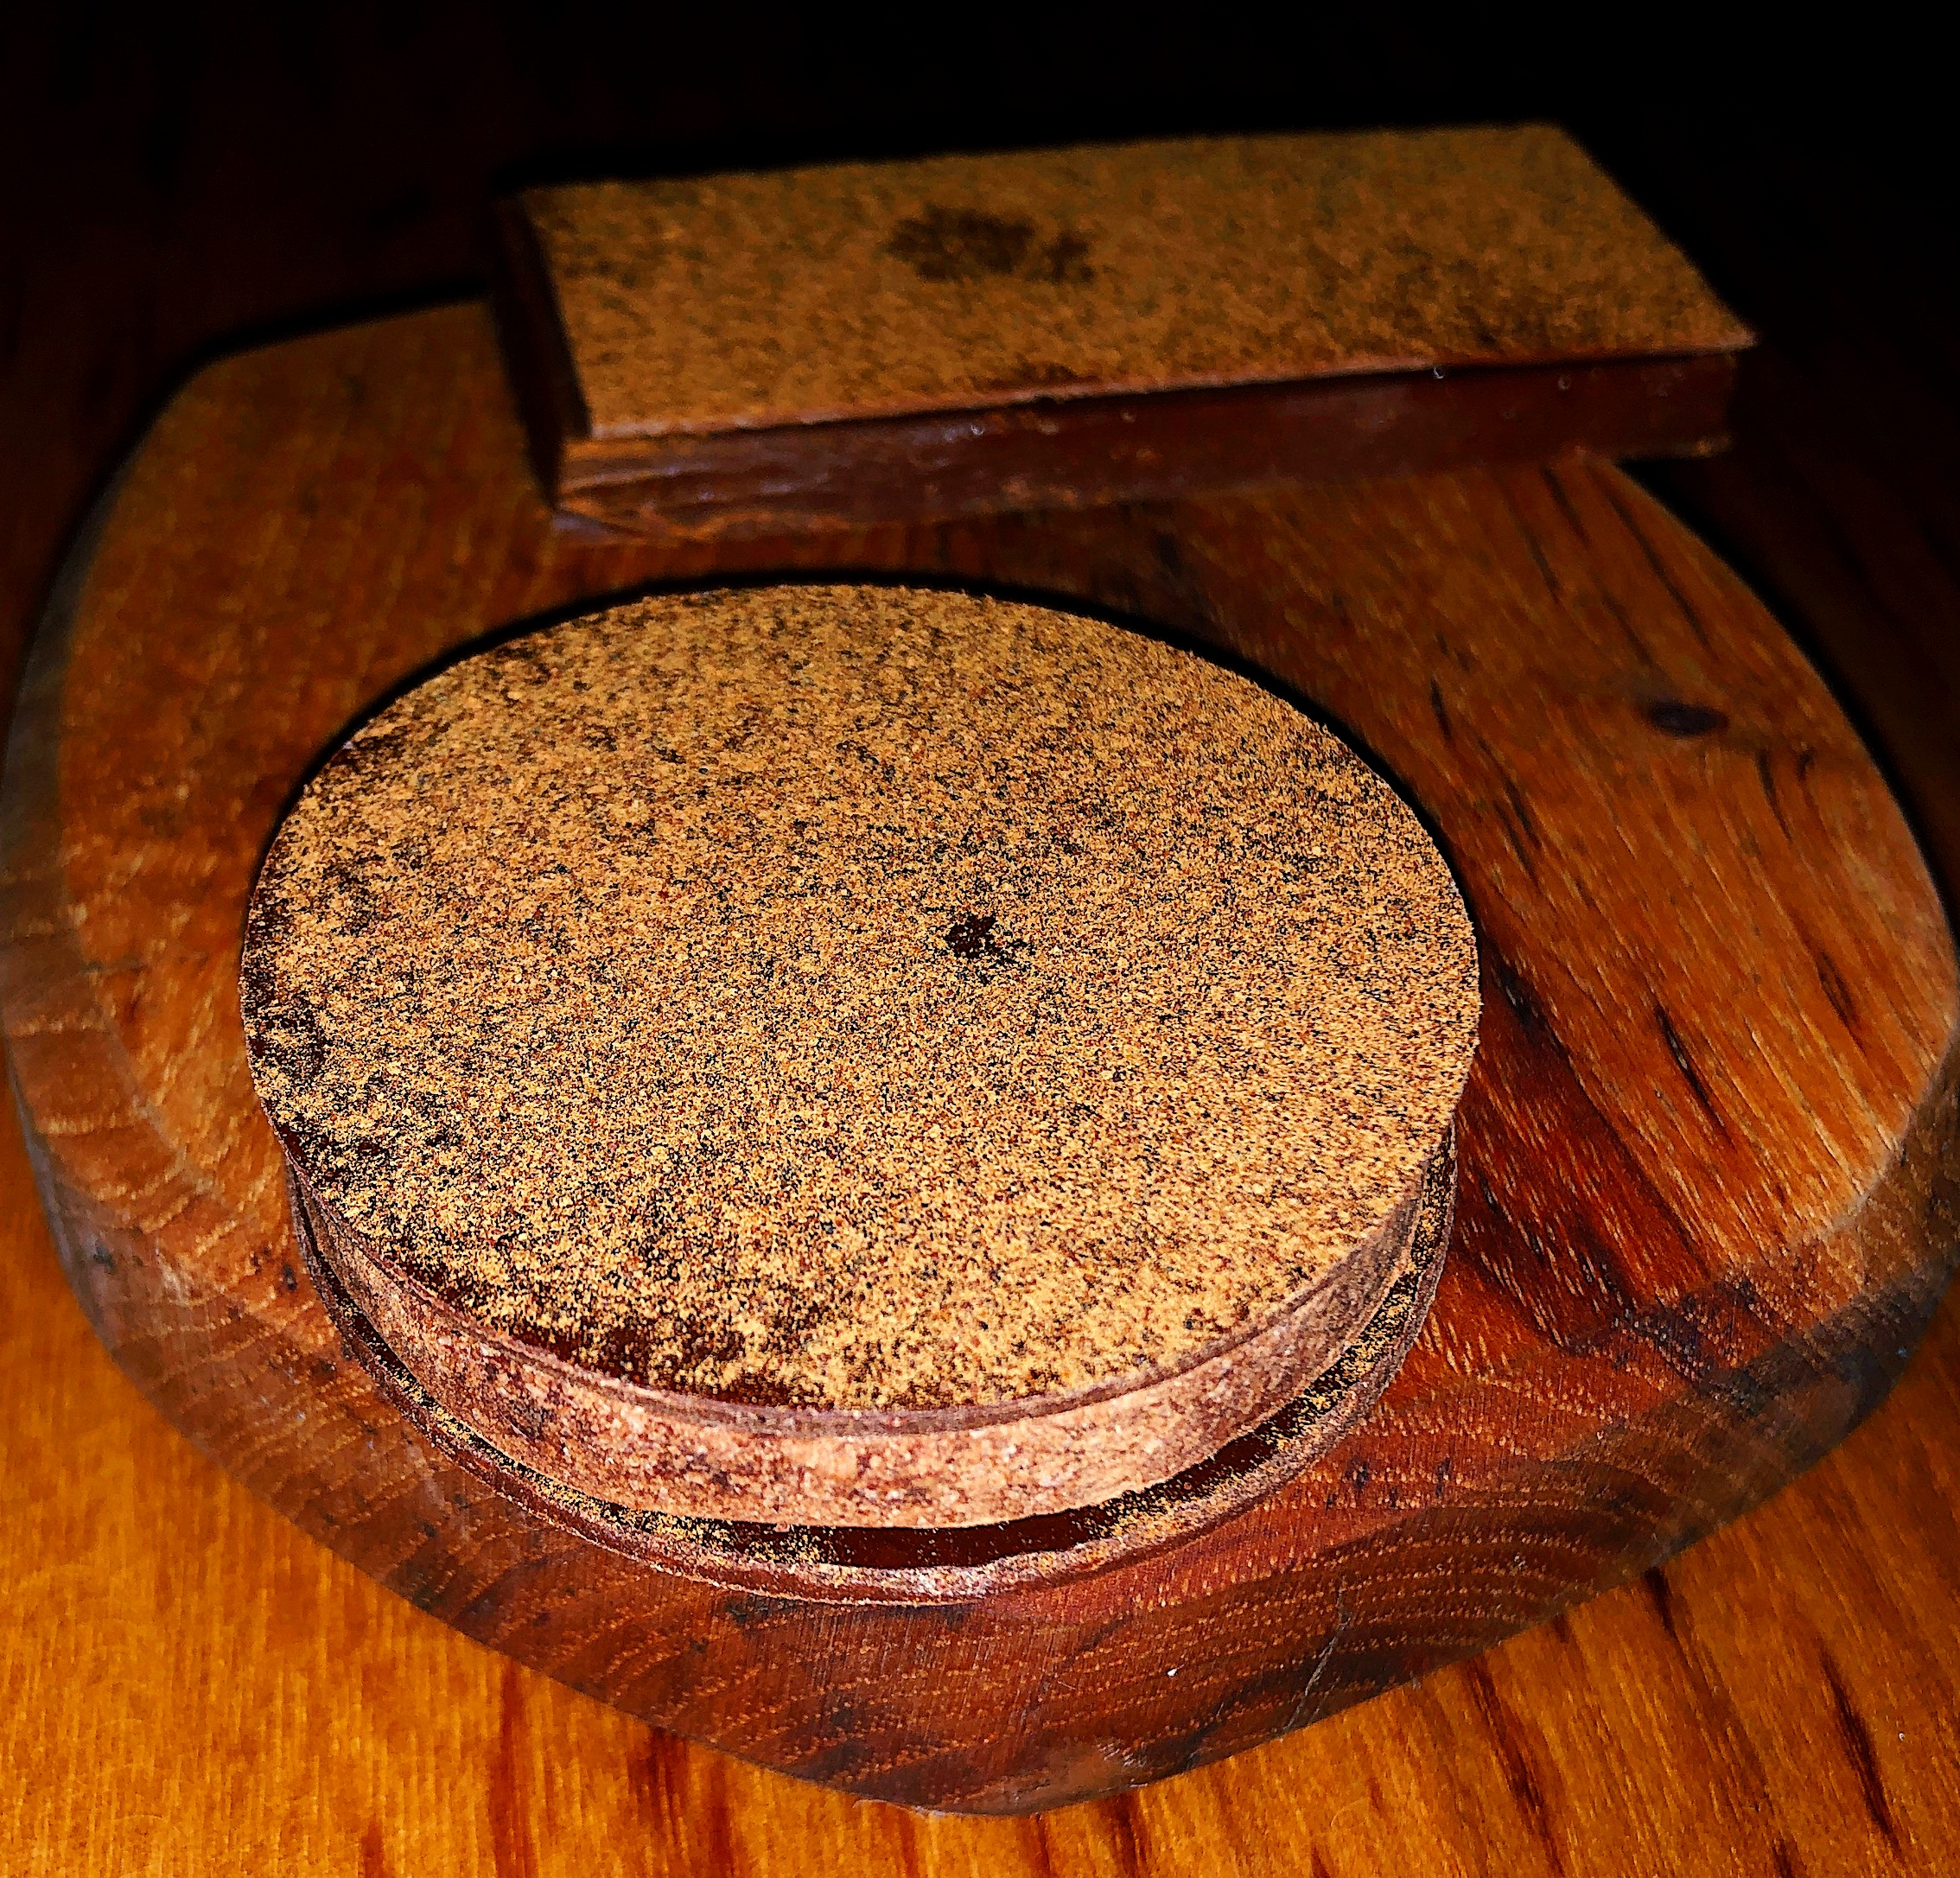 Milk Chocolate, Raspberry Preserves & Shiitake Mushrooms